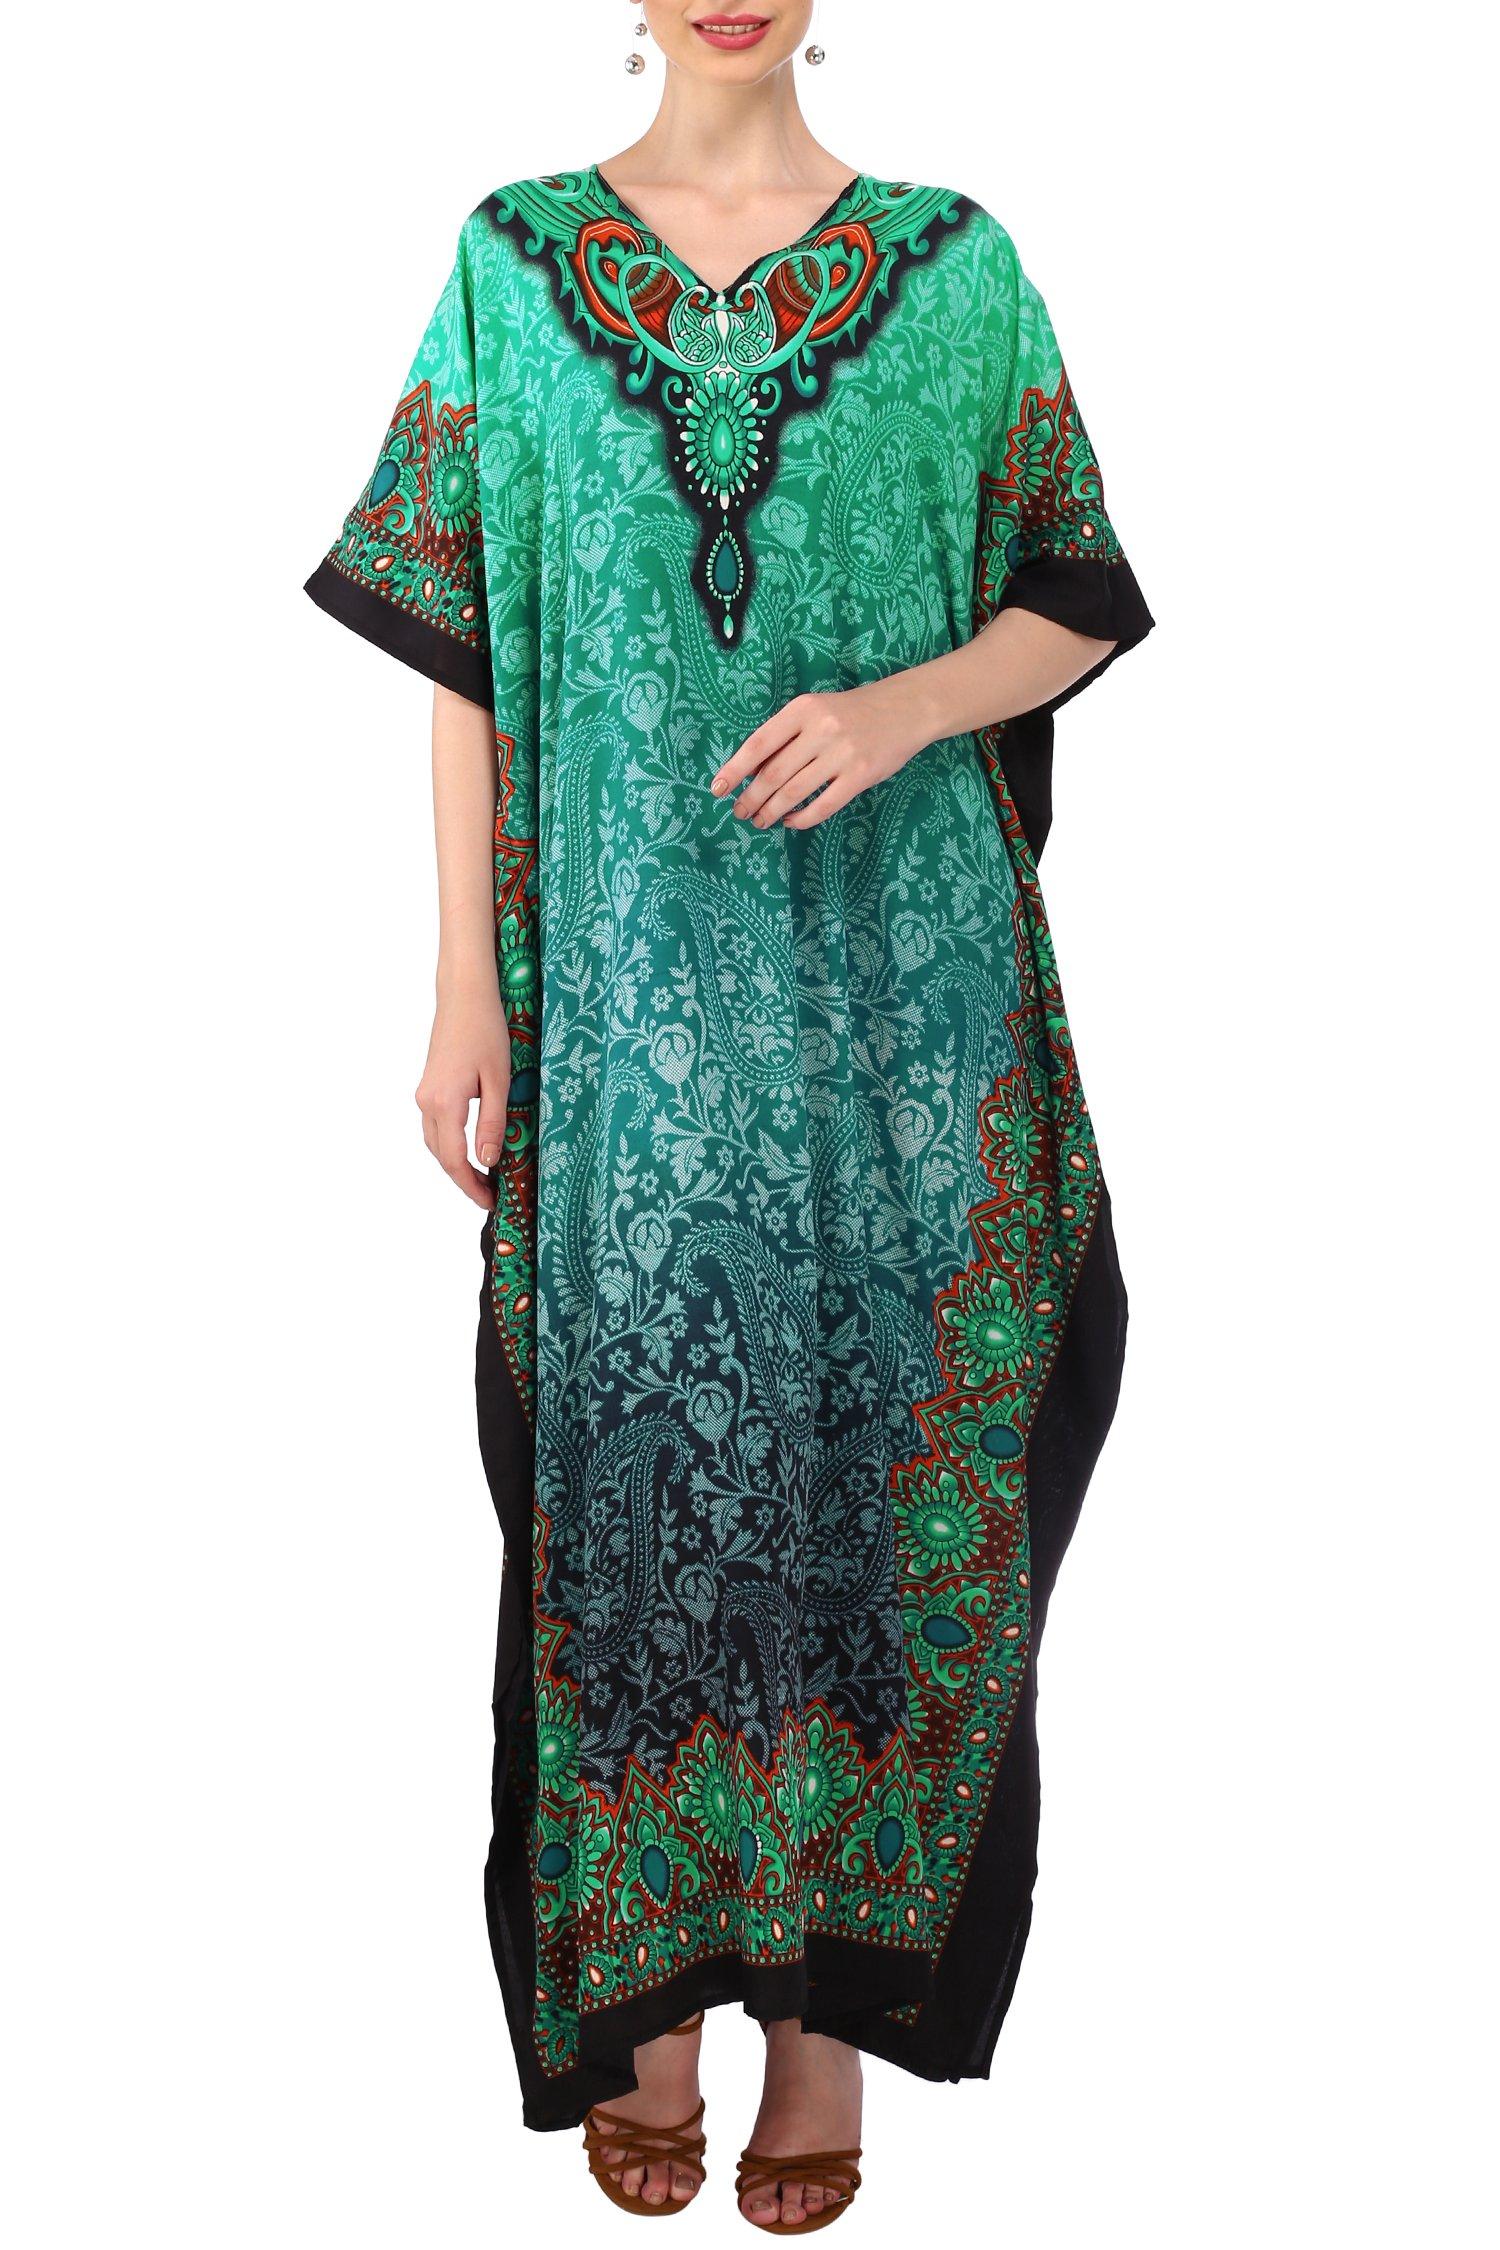 Miss Lavish London Women Kaftan Tunic Kimono Free Size Long Maxi Party Dress Loungewear Holidays Nightwear Beach Everyday Cover up Dresses by Miss Lavish London (Image #1)